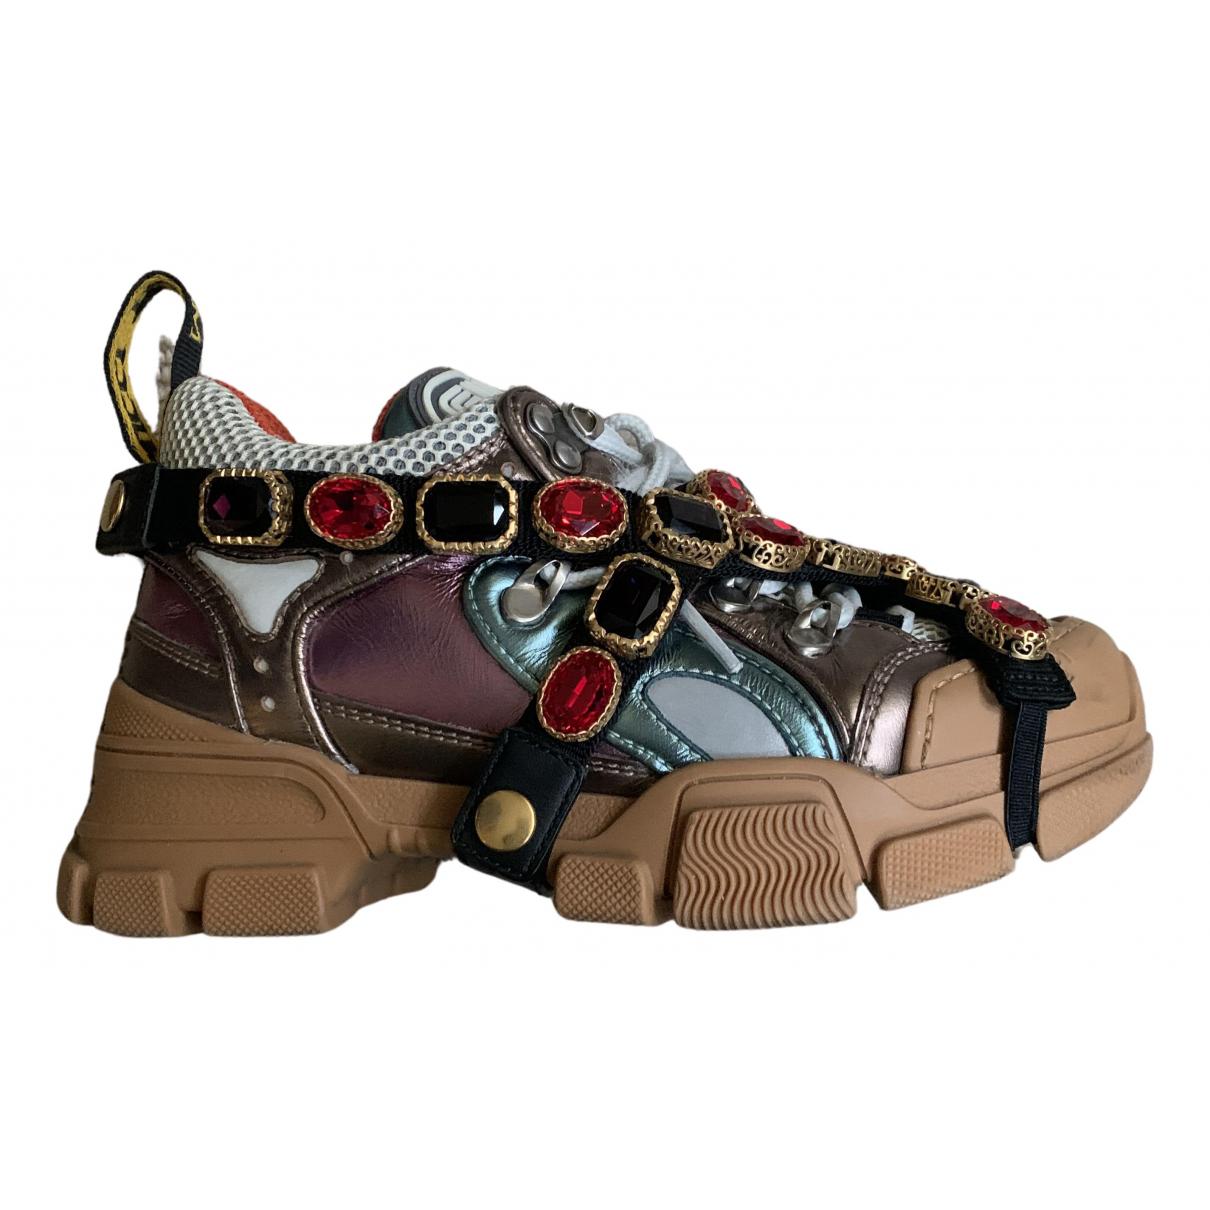 Gucci FlashTrek HighTop Multicolour Leather Trainers for Women 34.5 EU